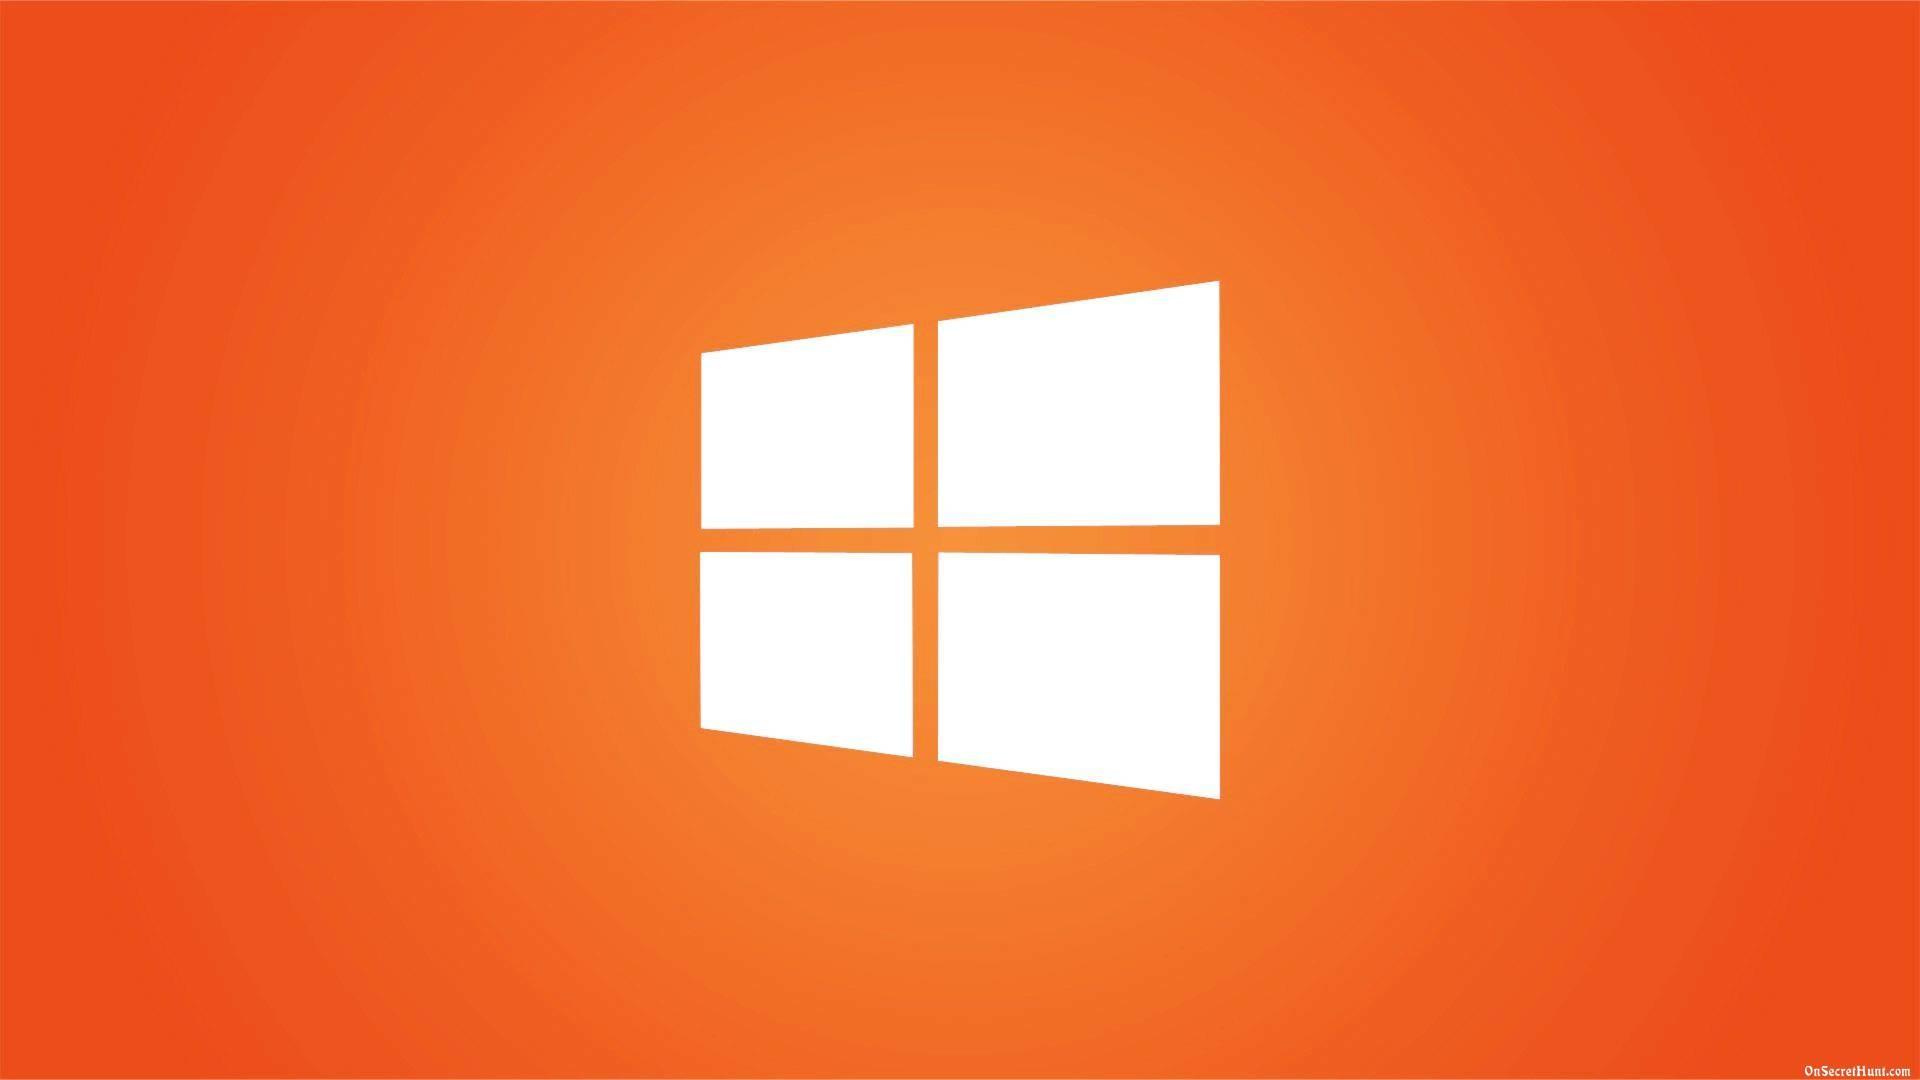 windows 8 hd wallpaper (78+ images)